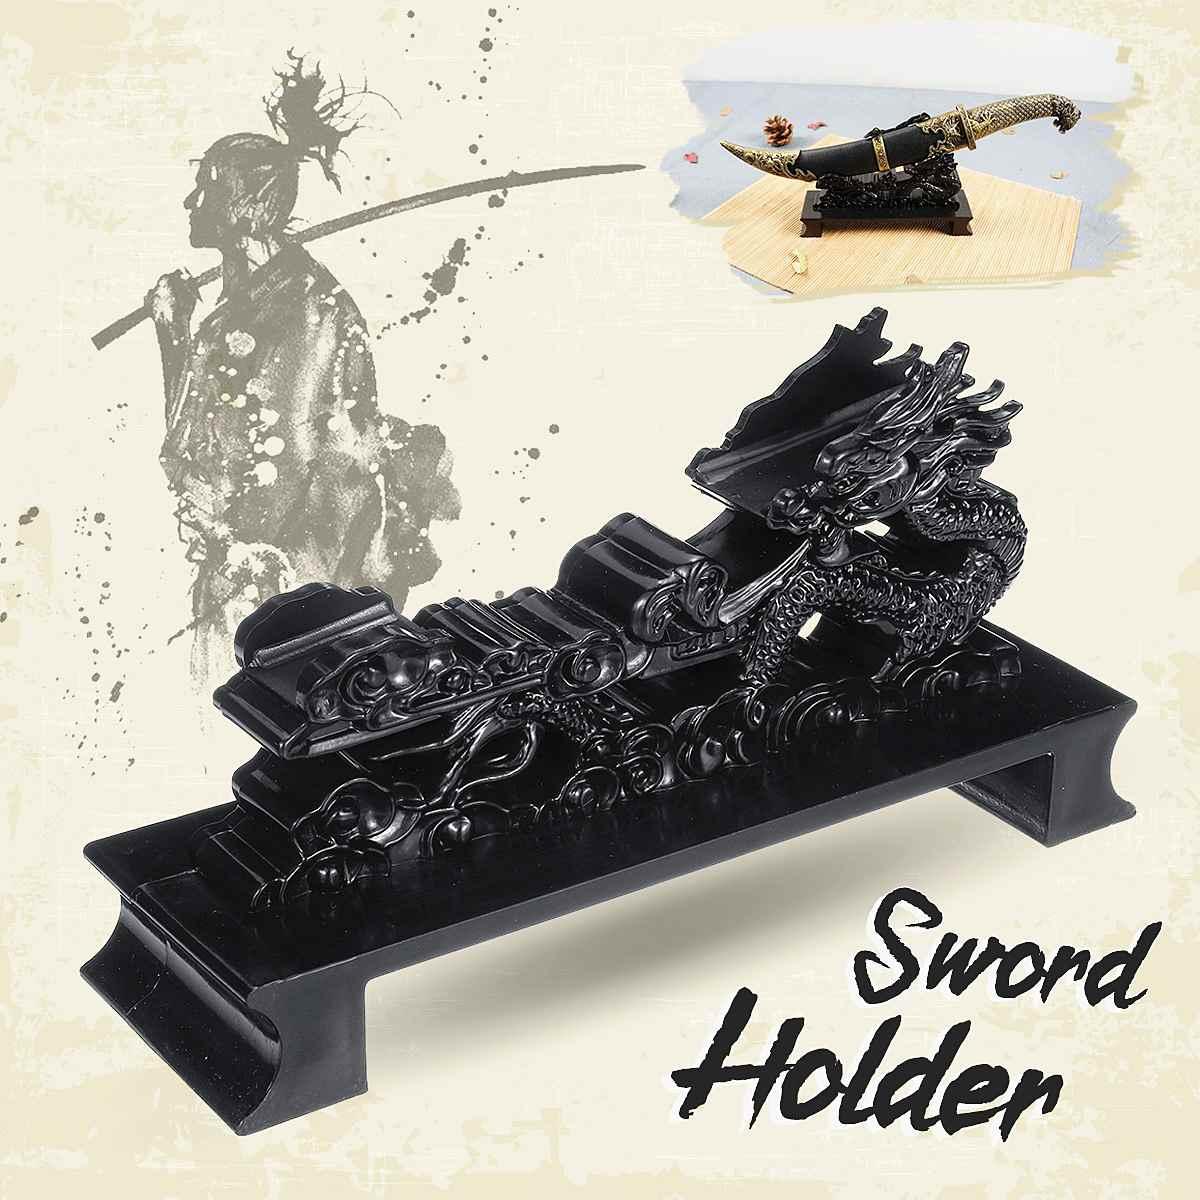 Samurai Sword Holder Katana Wakizashi Katana Holder Stand Wall Mount Display Dragon Figure Hanger Bracket Rack Home Decoration